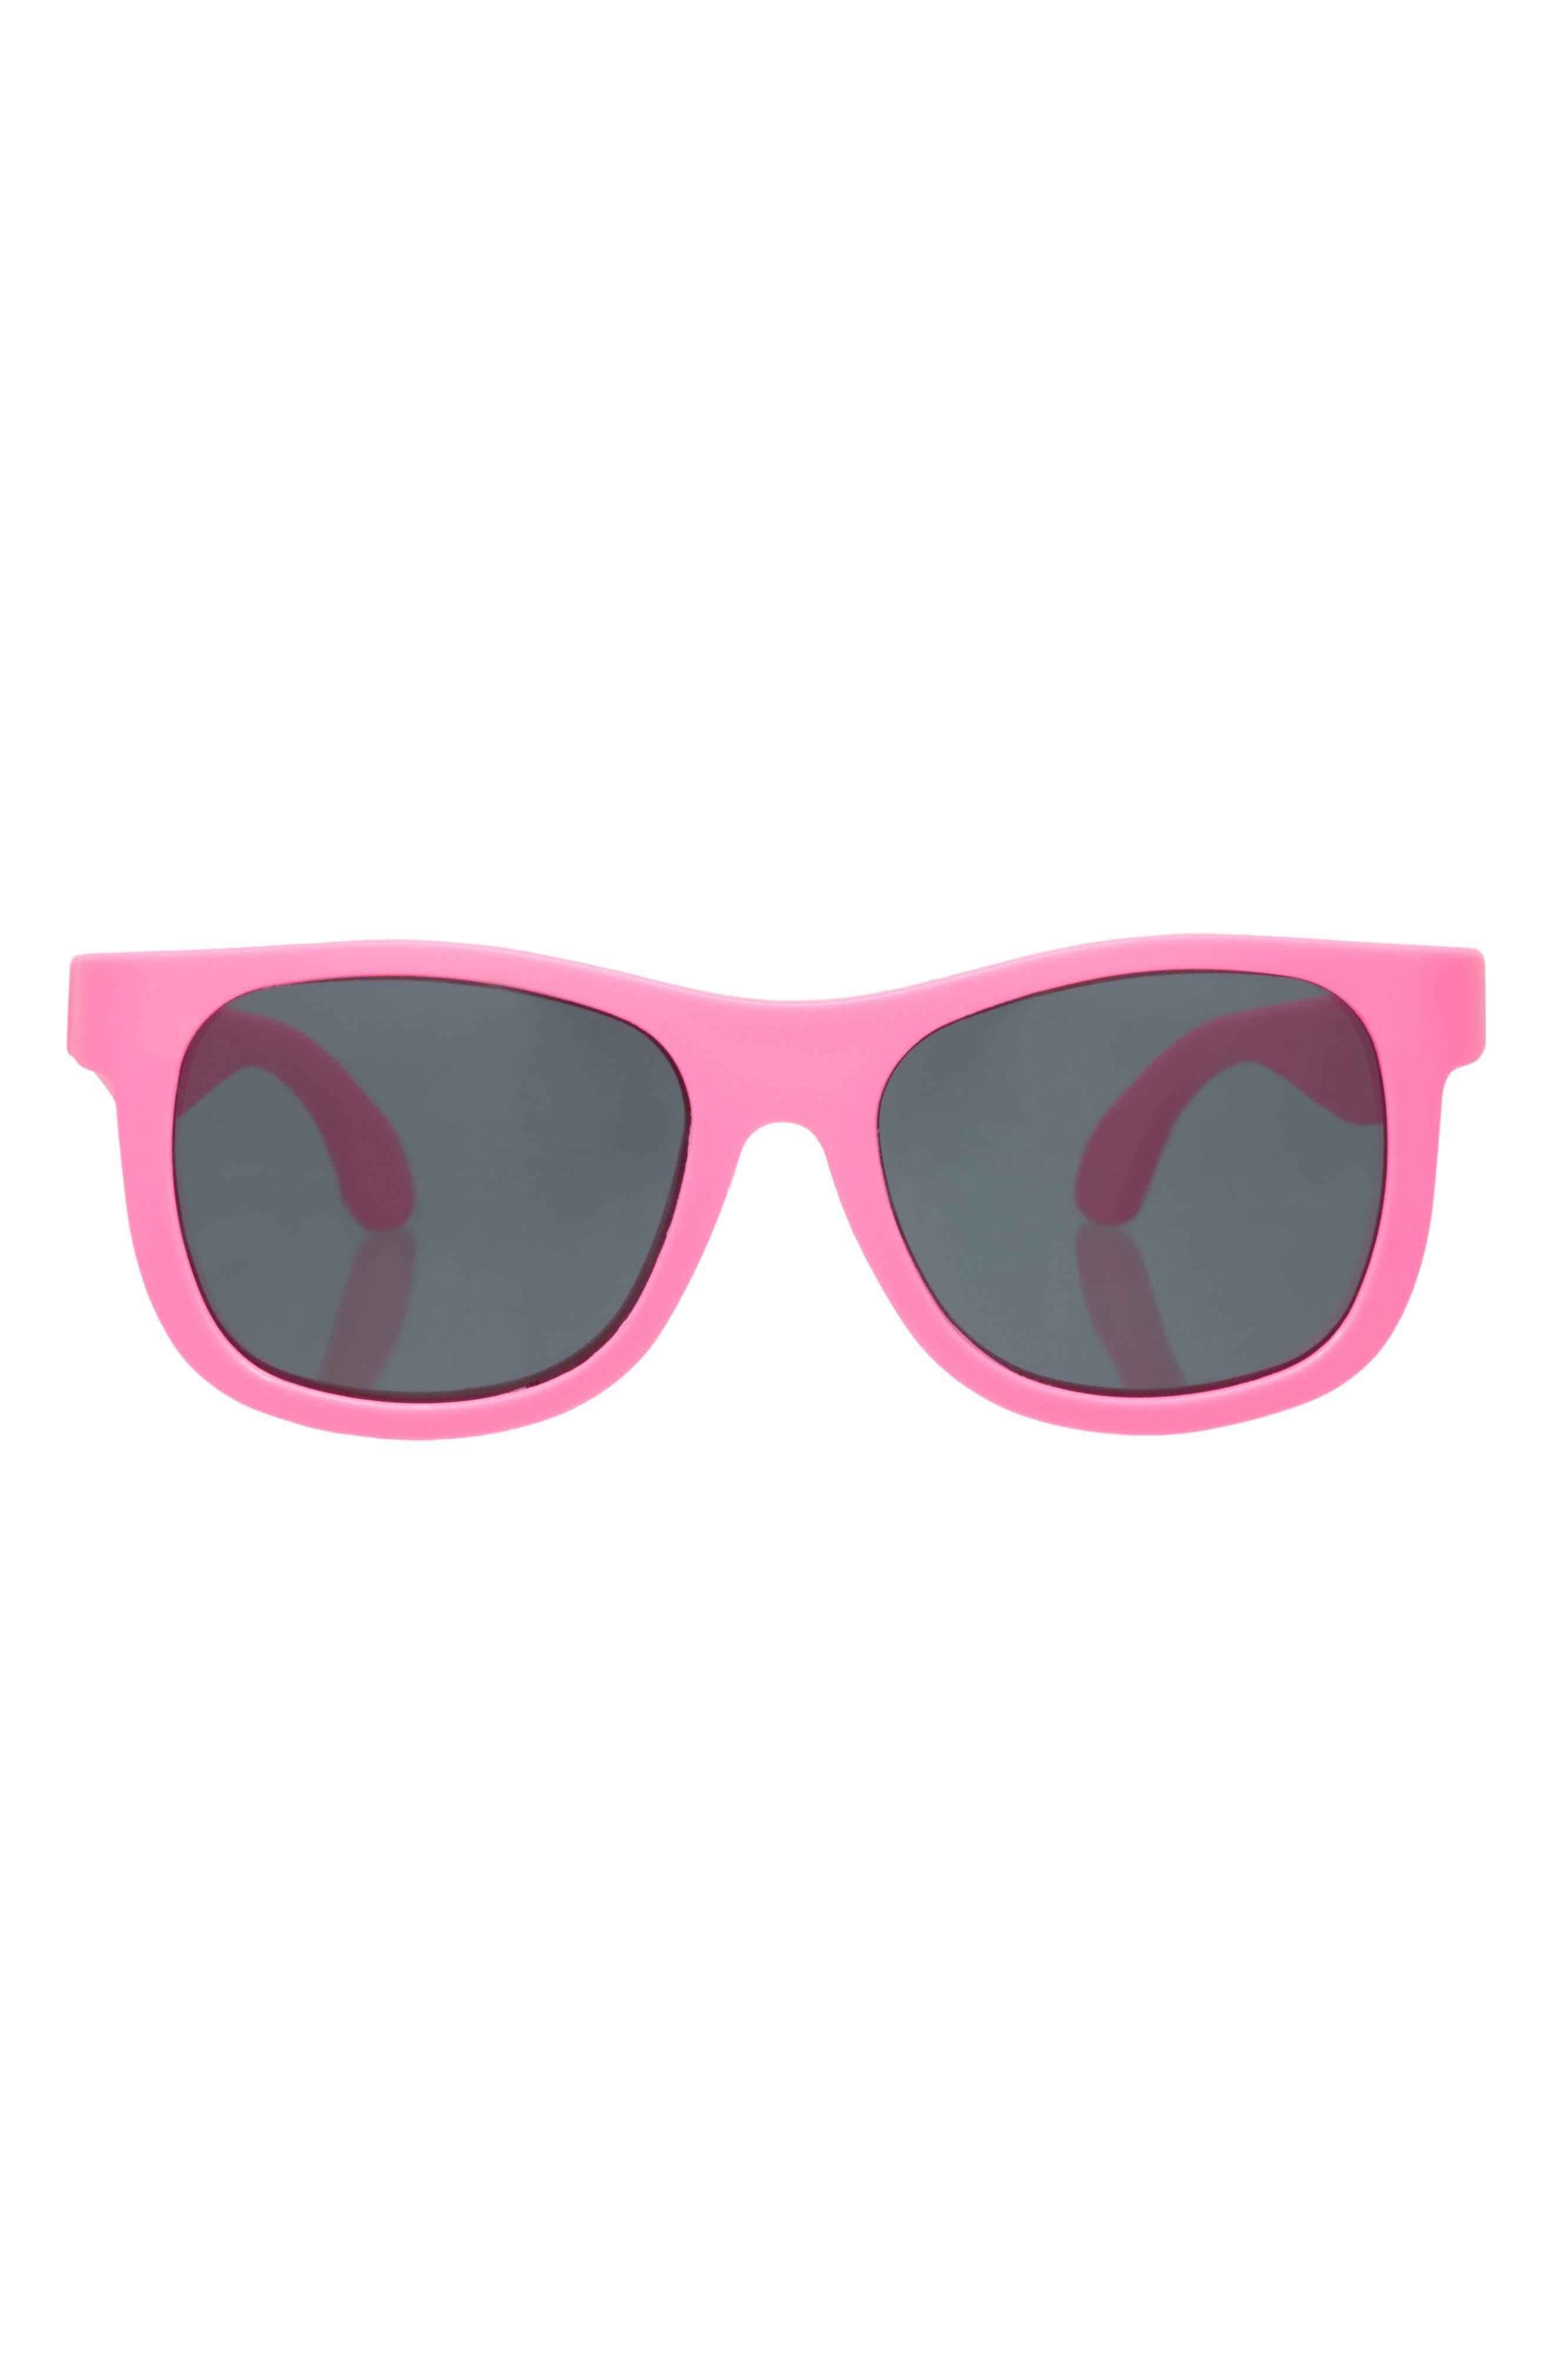 Toddler Babiators Original Aviator Sunglasses  Think Pink